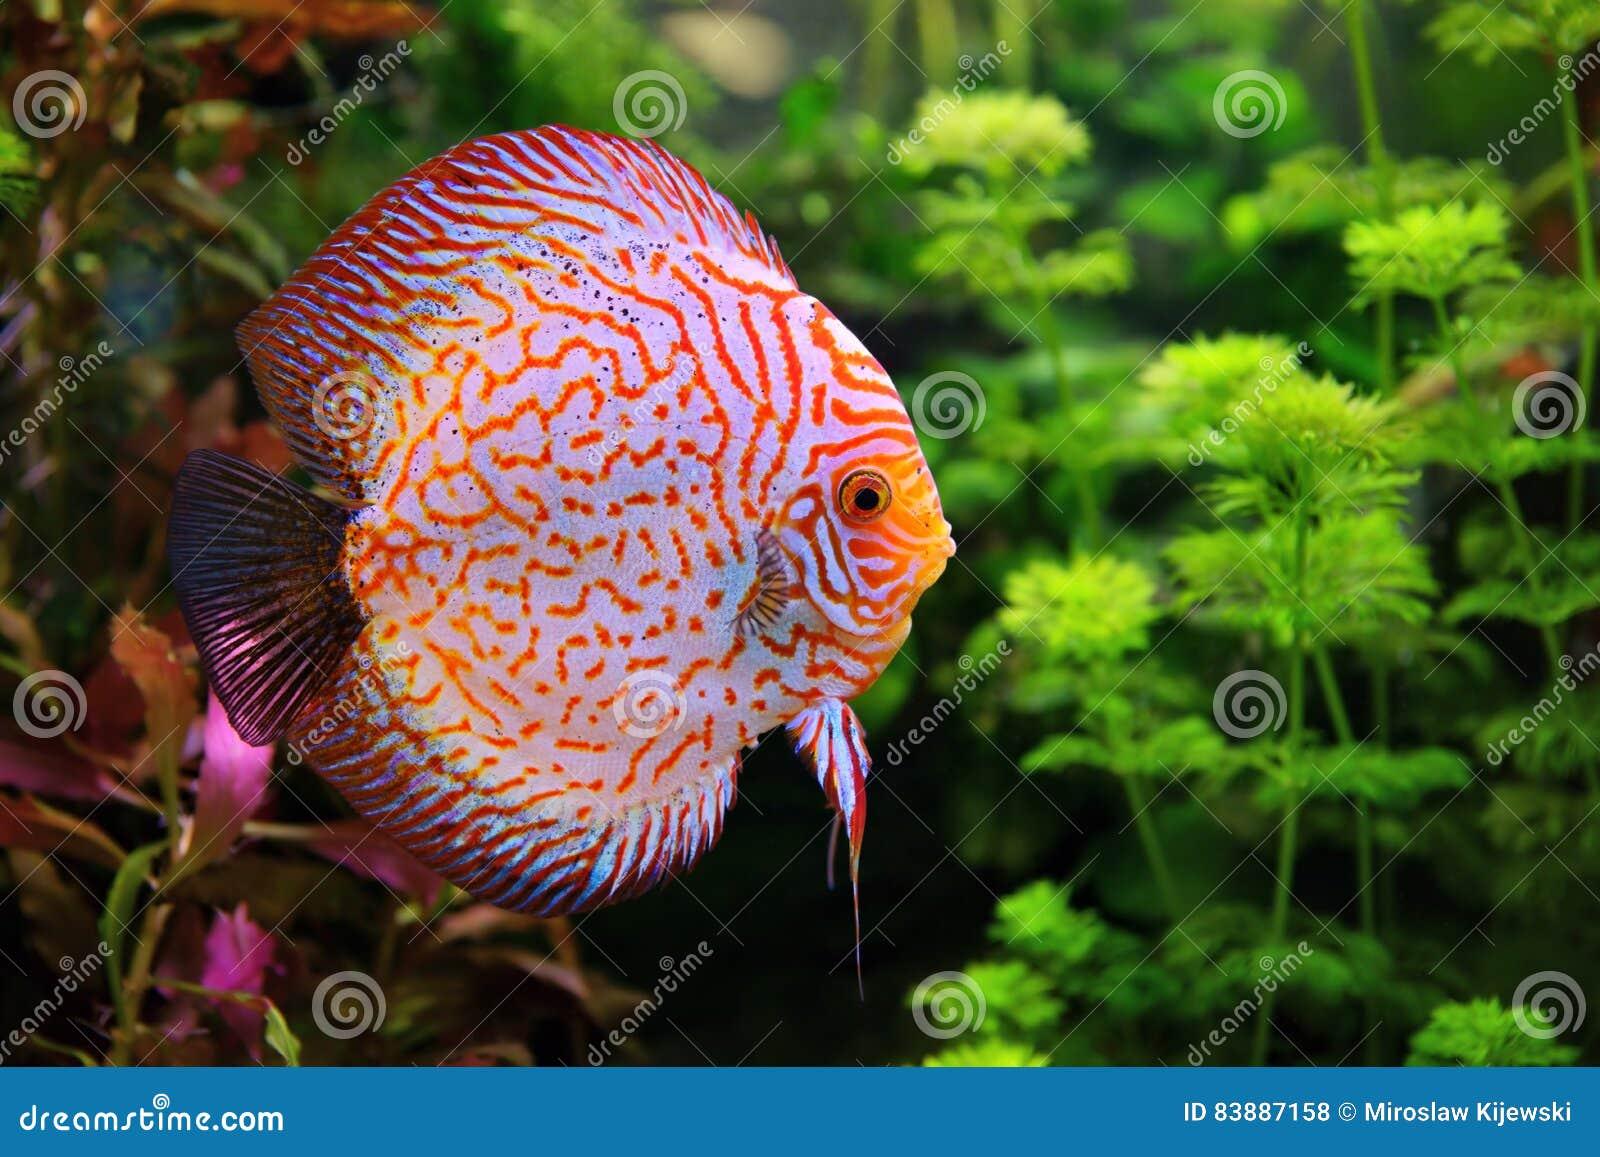 Discus Symphysodon, Multi-colored Cichlid In The Aquarium Stock ...